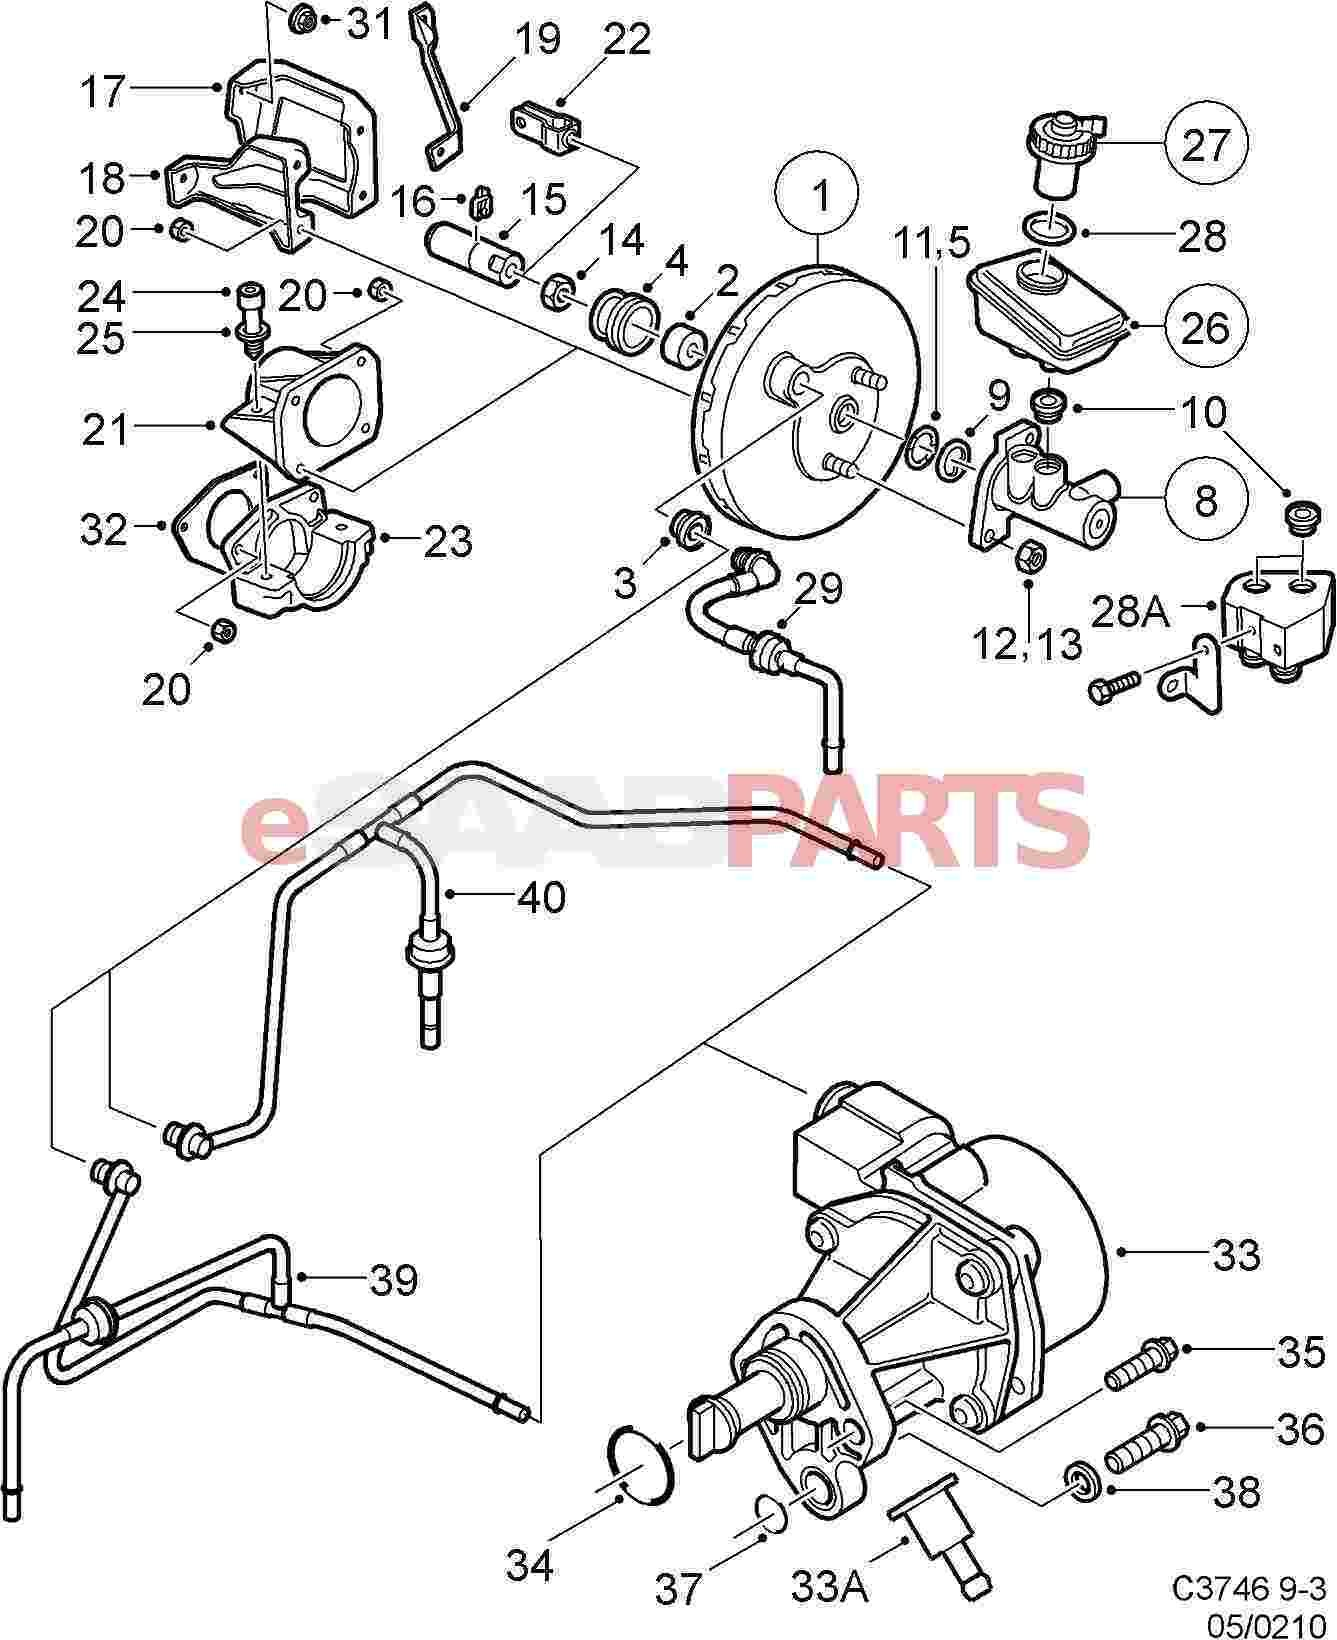 Vacuum diagram 2004 saab wiring diagram news u2022 rh lomond tw saab 9 5 engine diagram saab 9 5 engine diagram